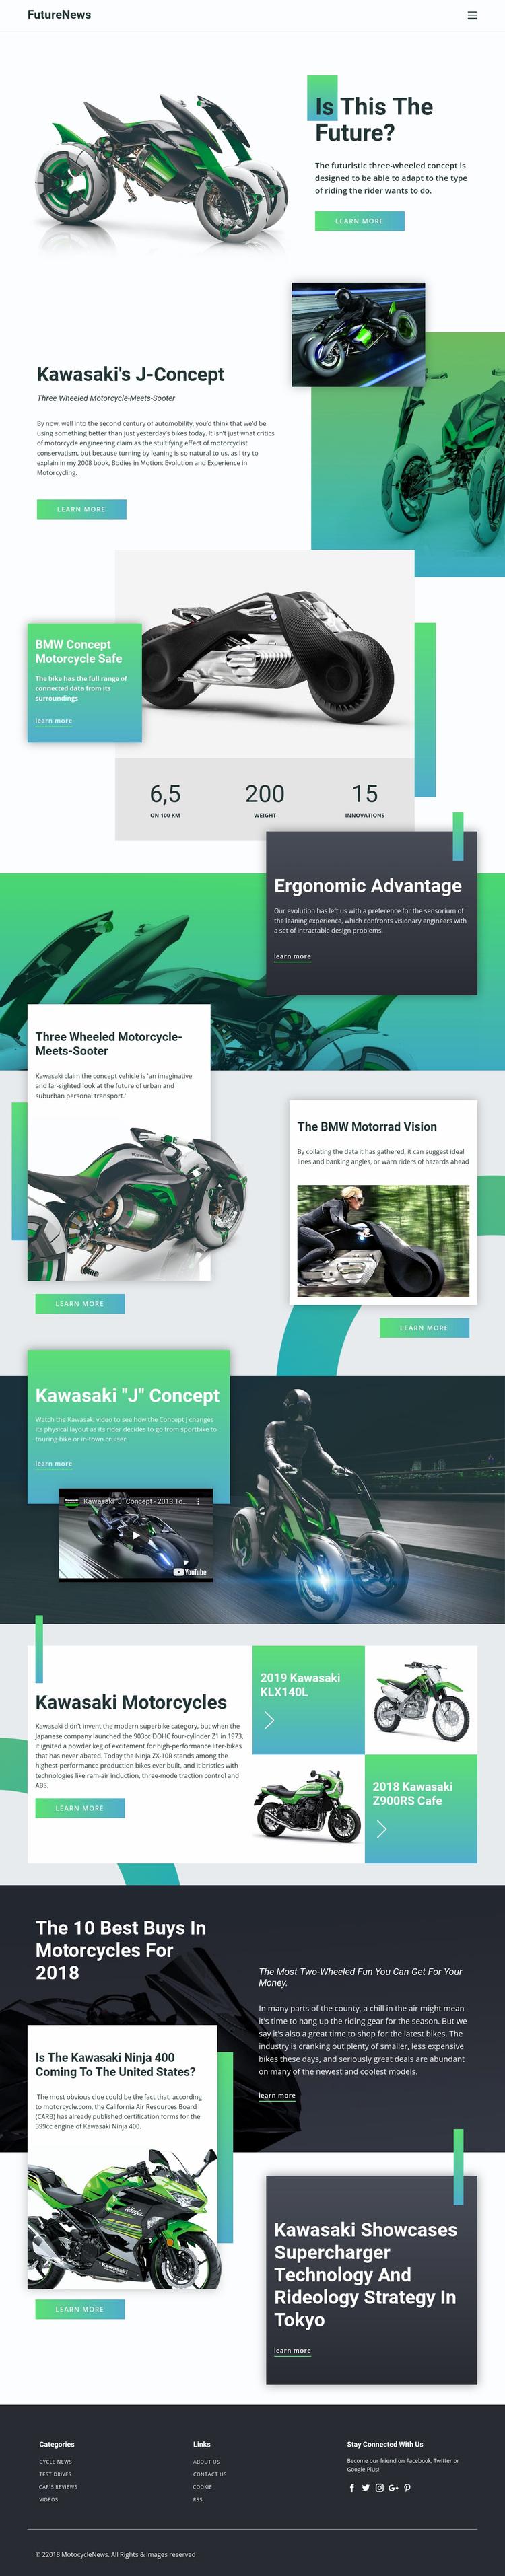 Future News Web Page Designer